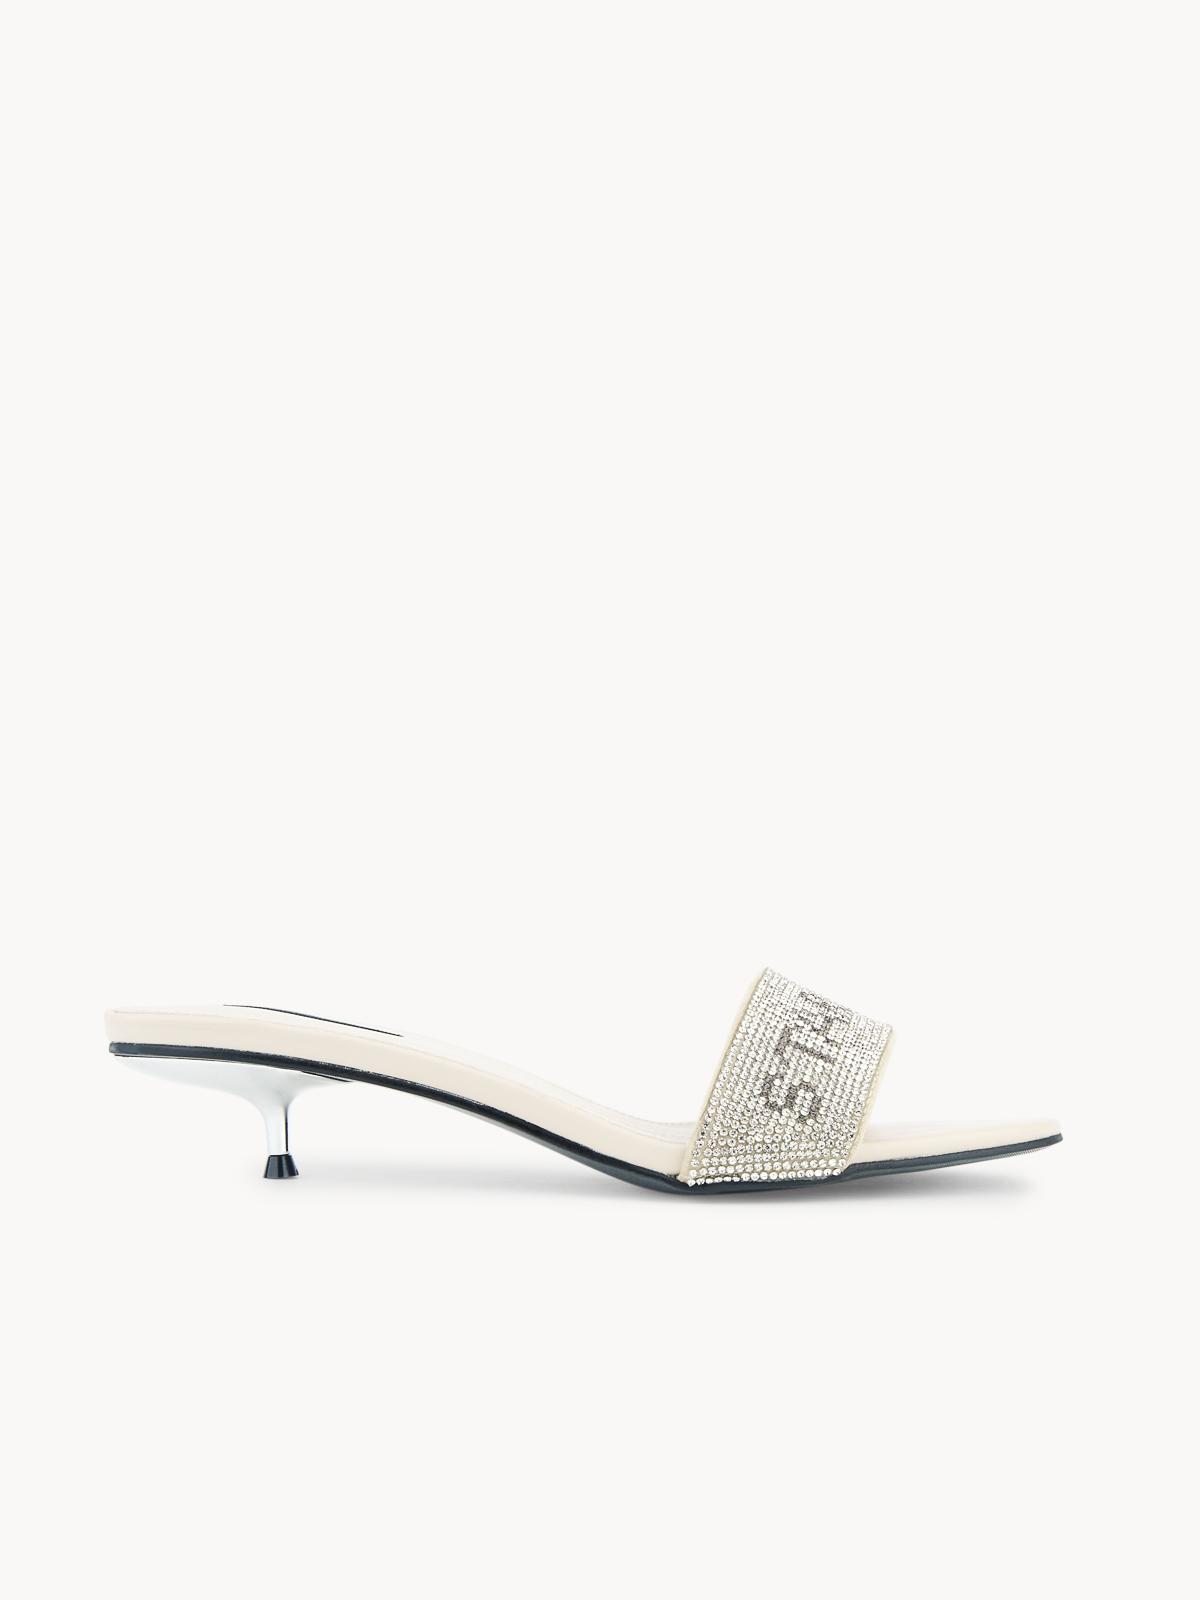 Starkela Flashy Sandal Heels Beige